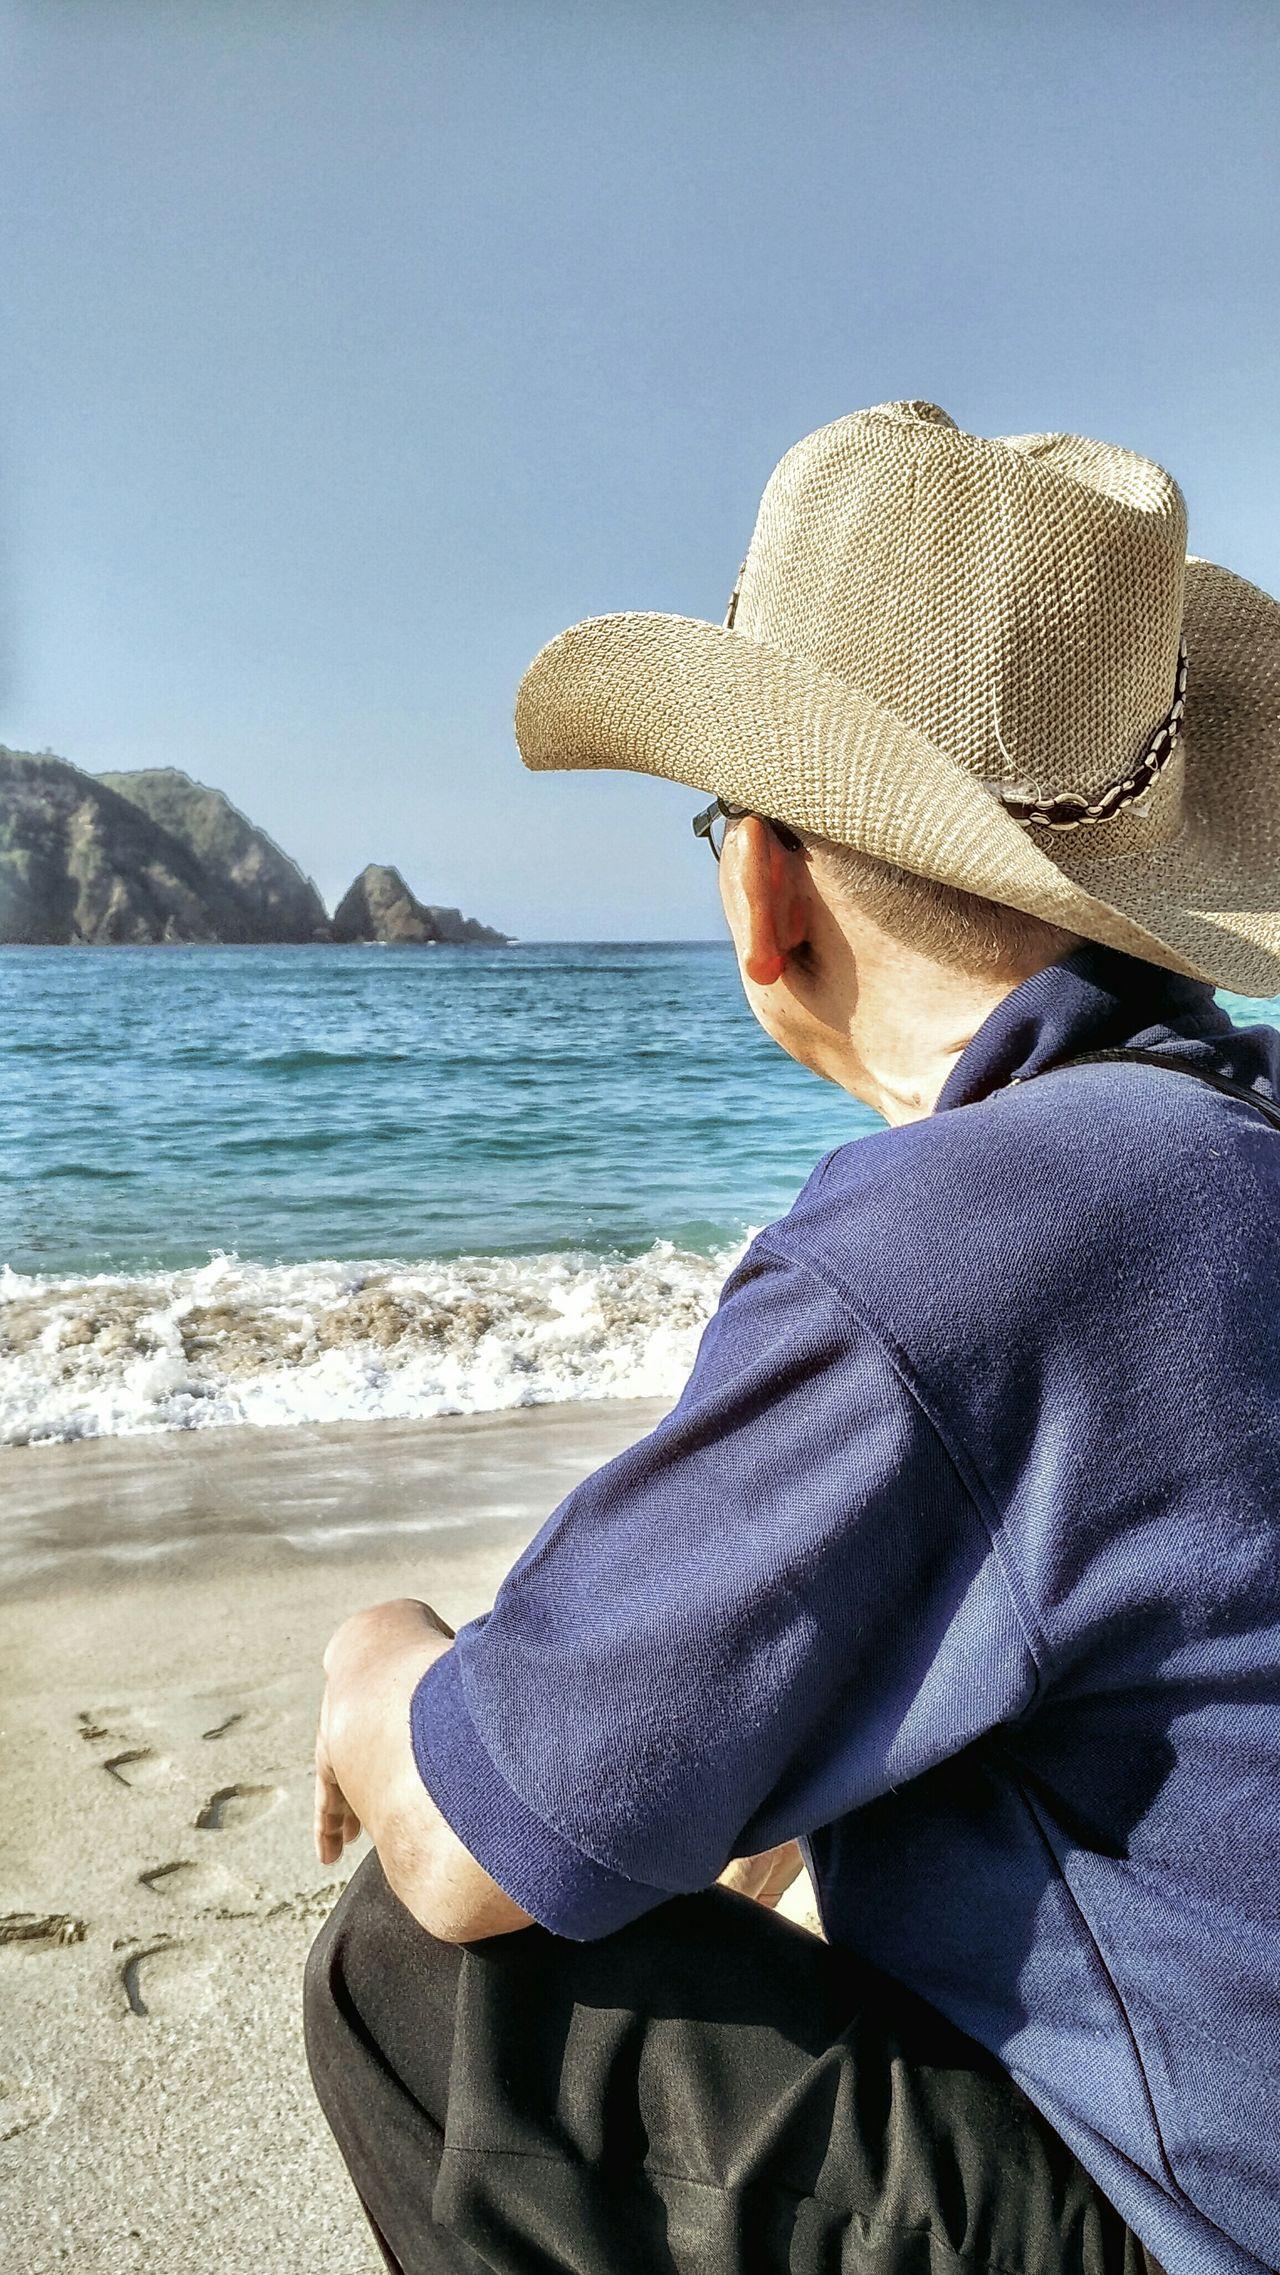 Beach cowboy Lombok Beach Hello World Enjoying Life Relaxing Water Landscape Nature Travel Travel Photography